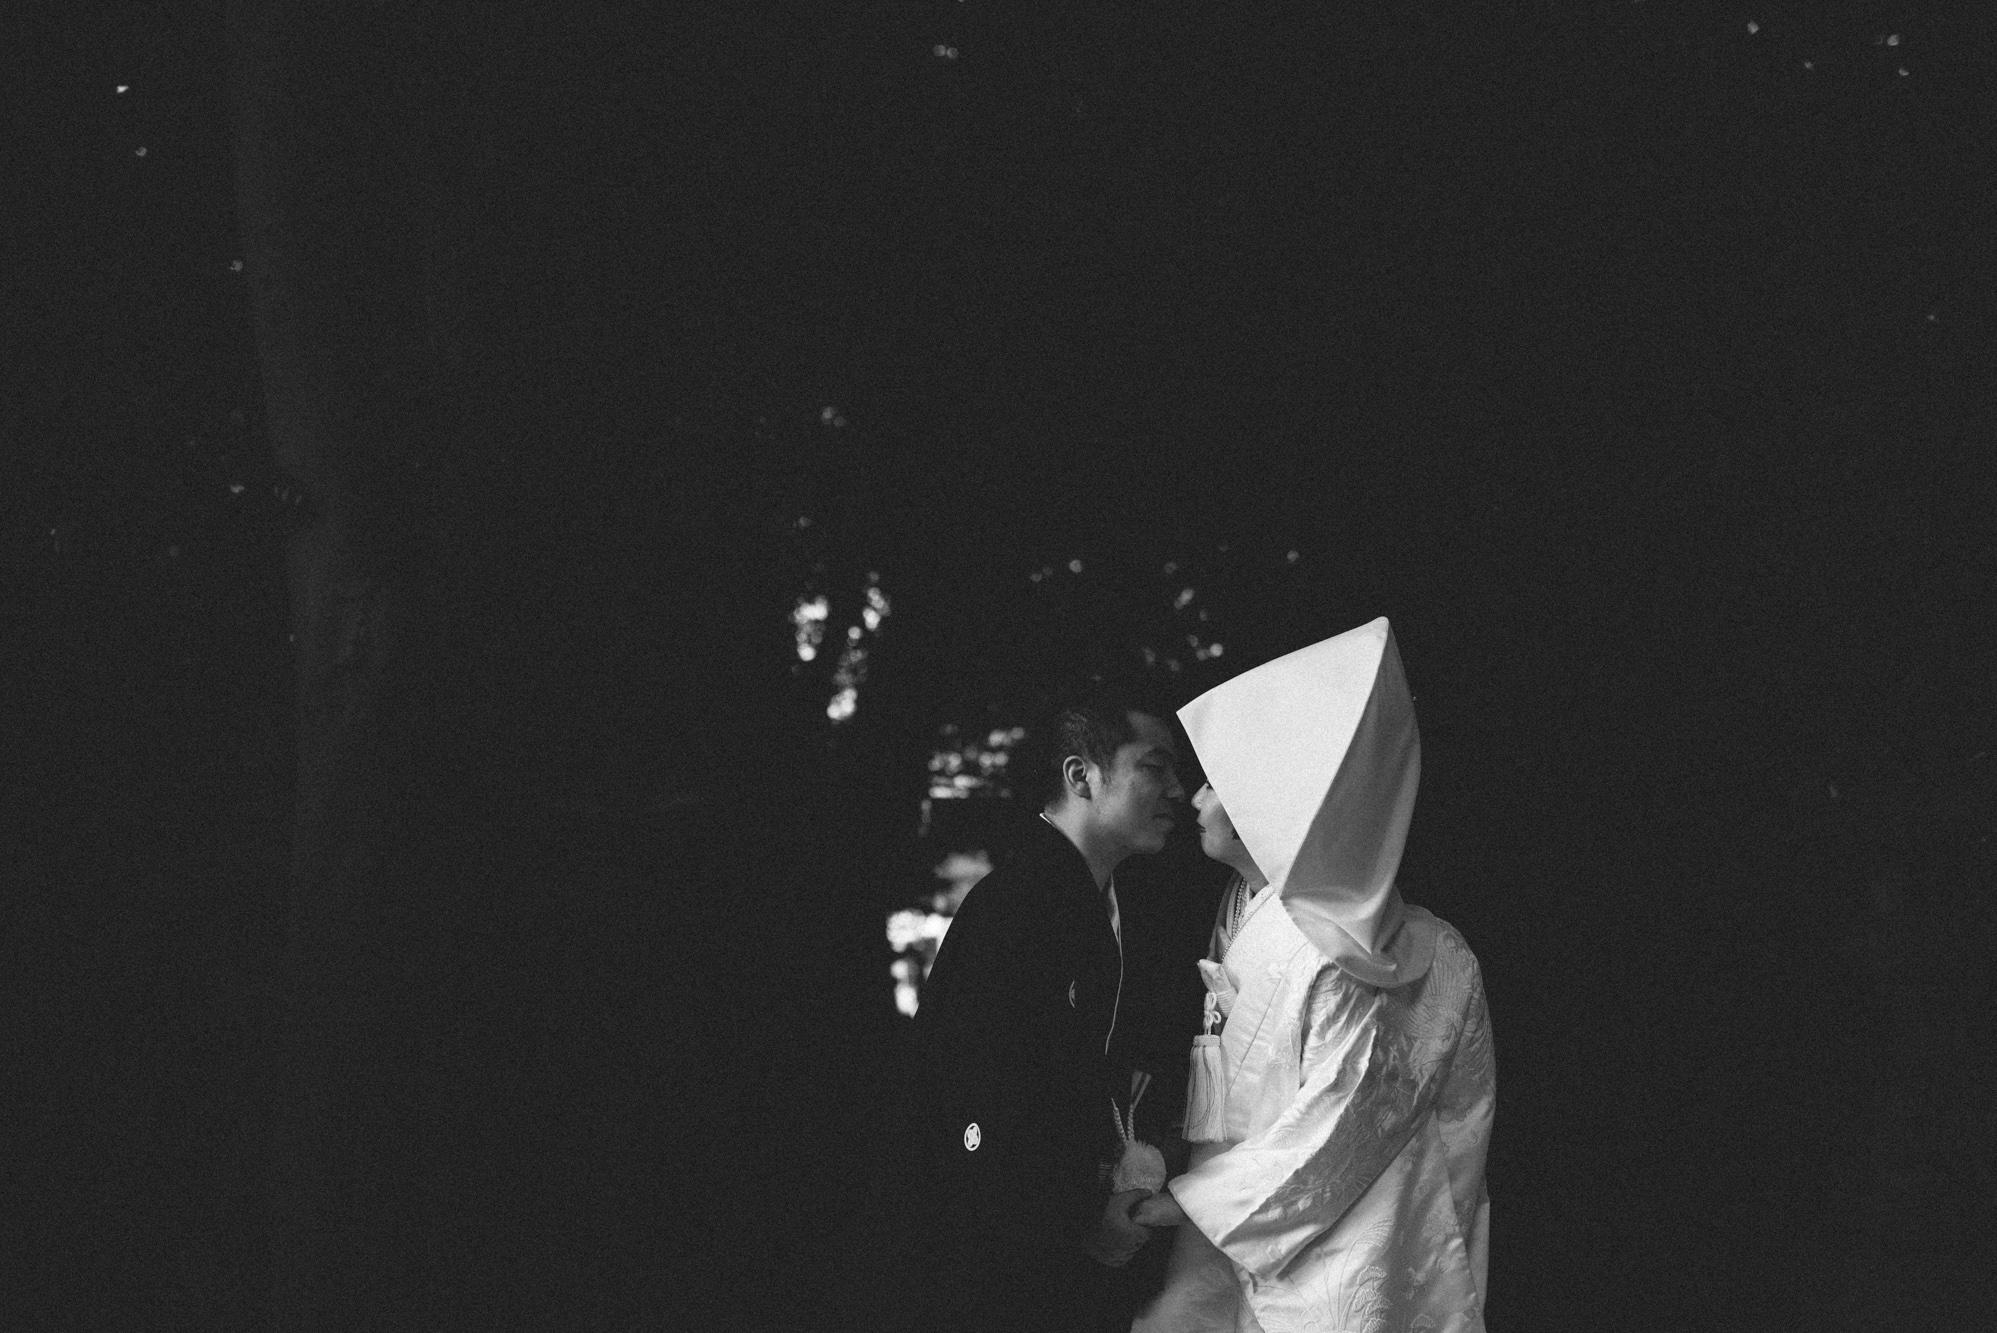 wedding maedori 00070005